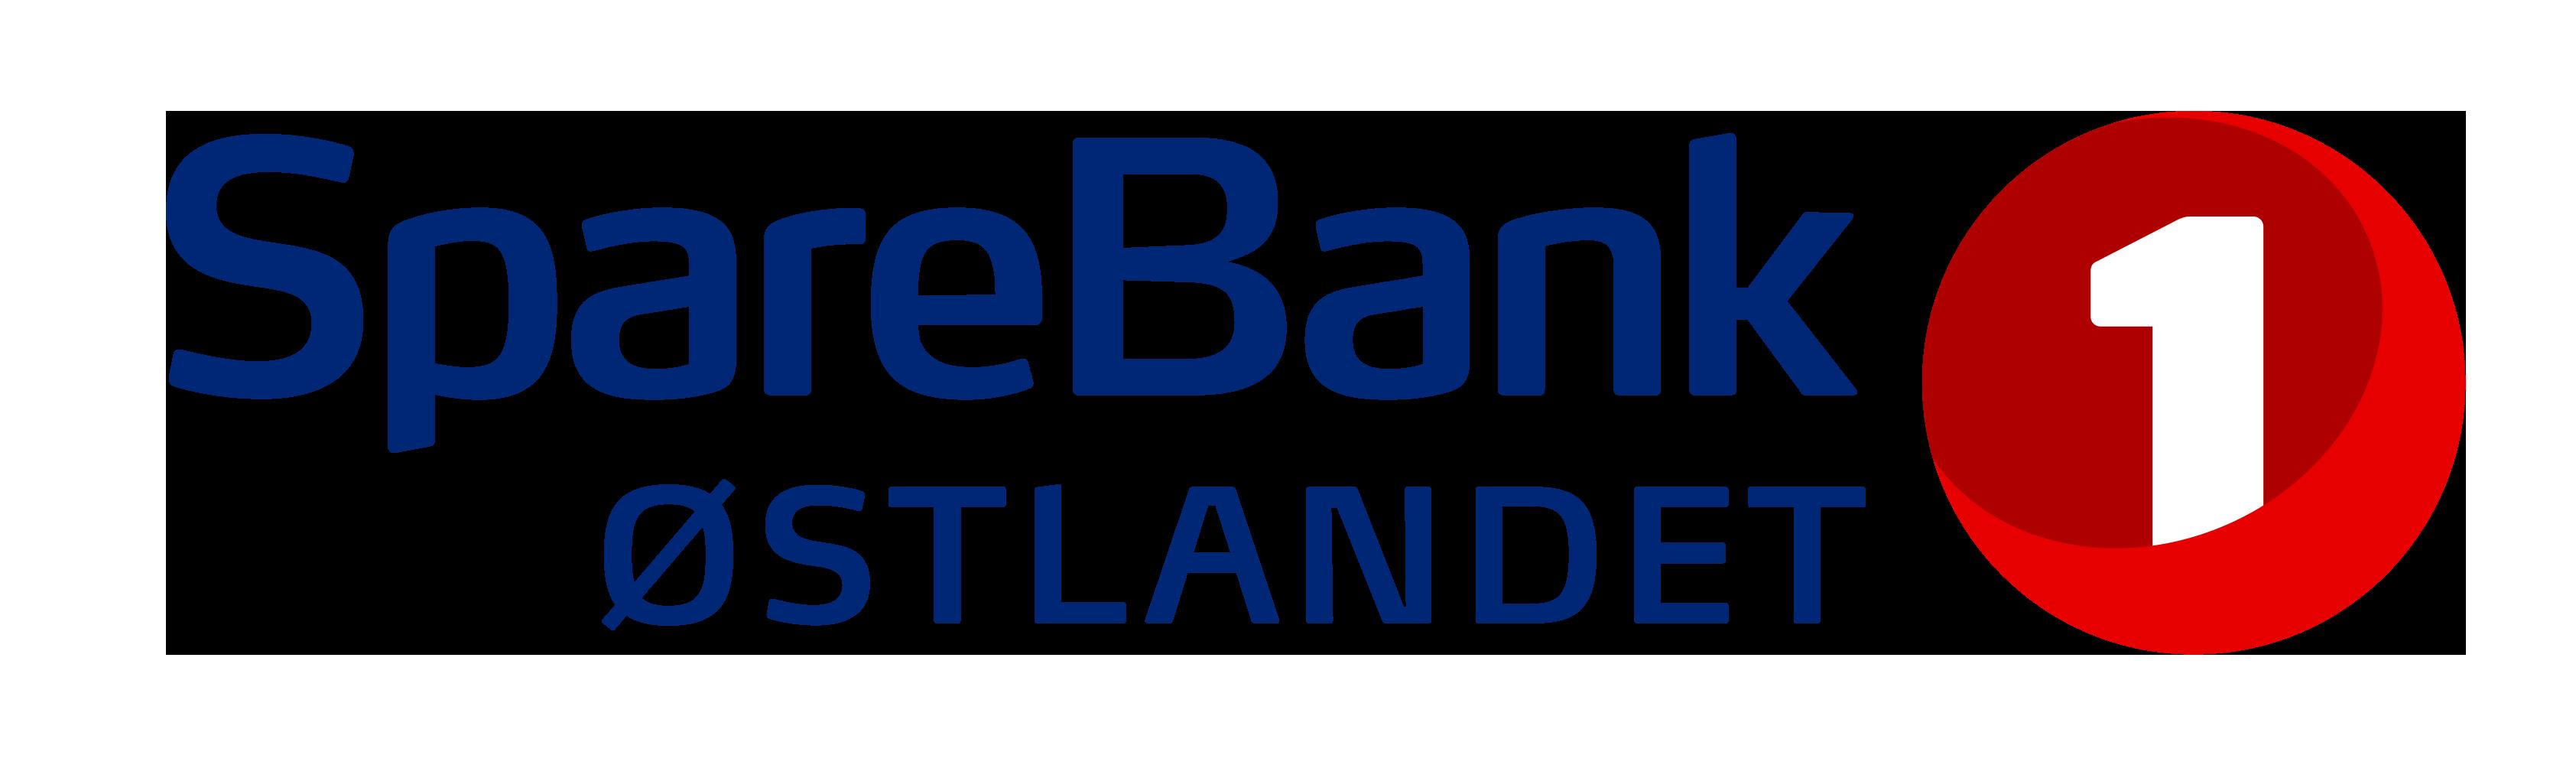 Sparebank 1 Østlandet's logo.